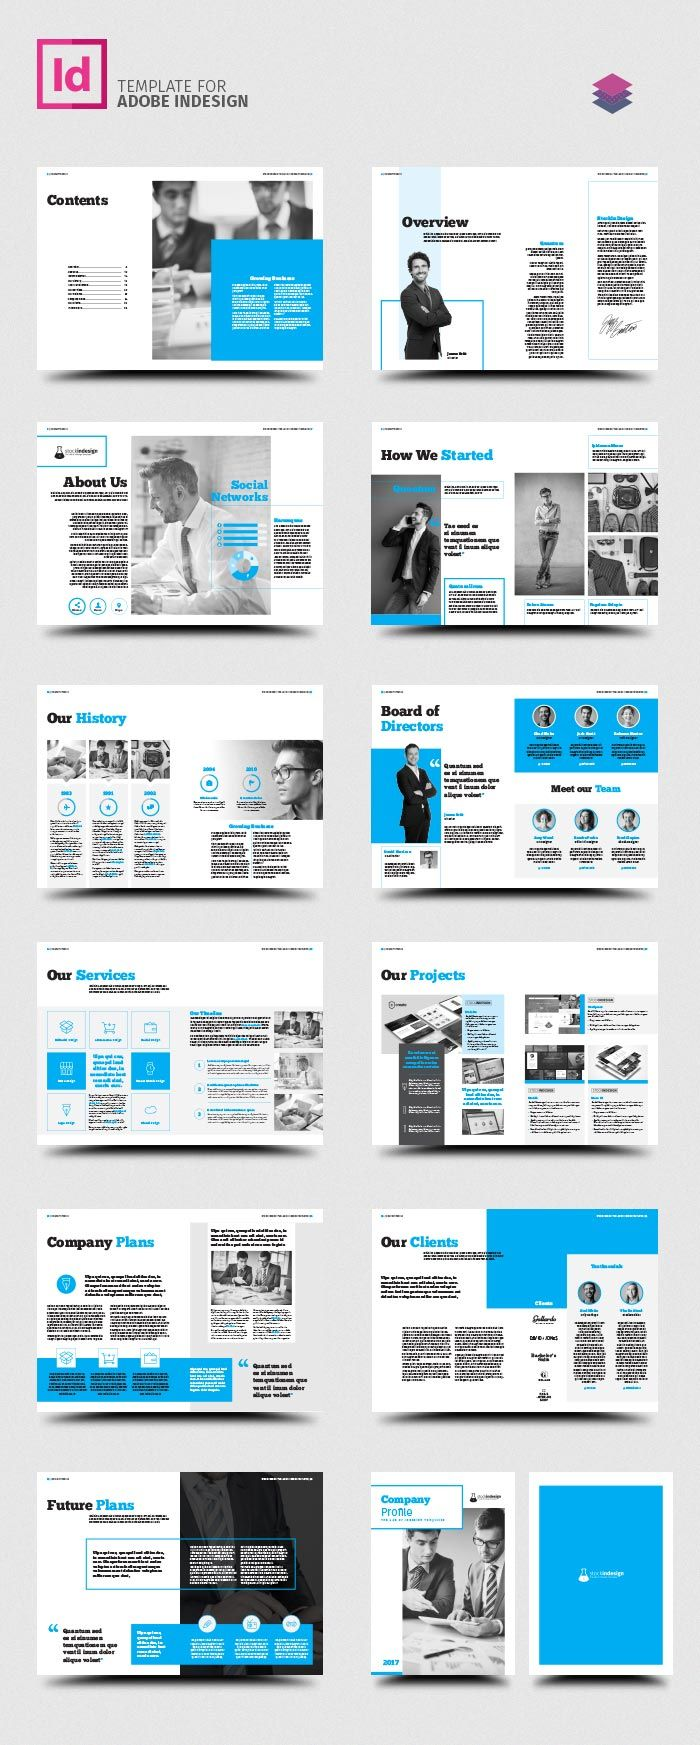 Company Profile Template Pinteres